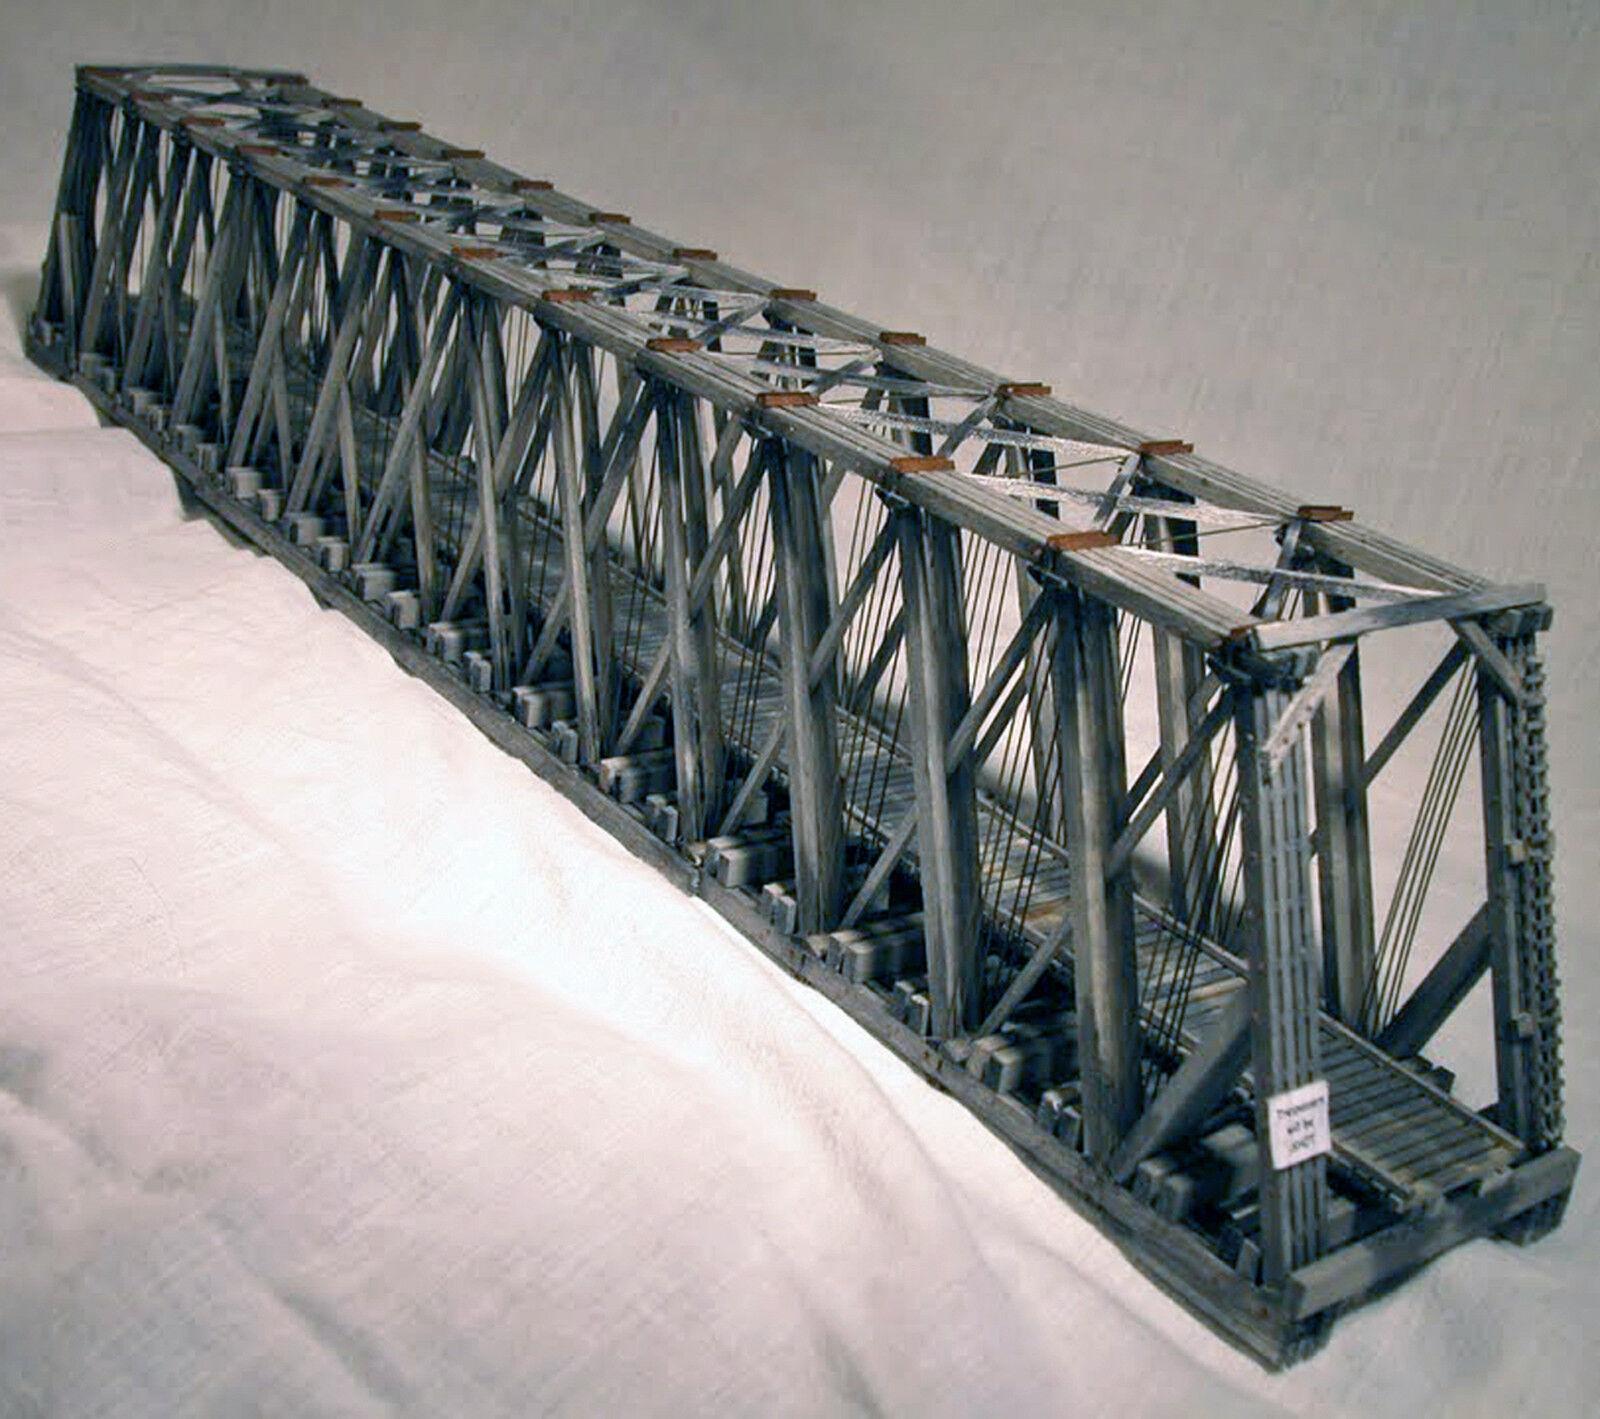 170' Puente Truss a través de Howe N modelo del ferrocarril estructura Craftsman Kit HL104N